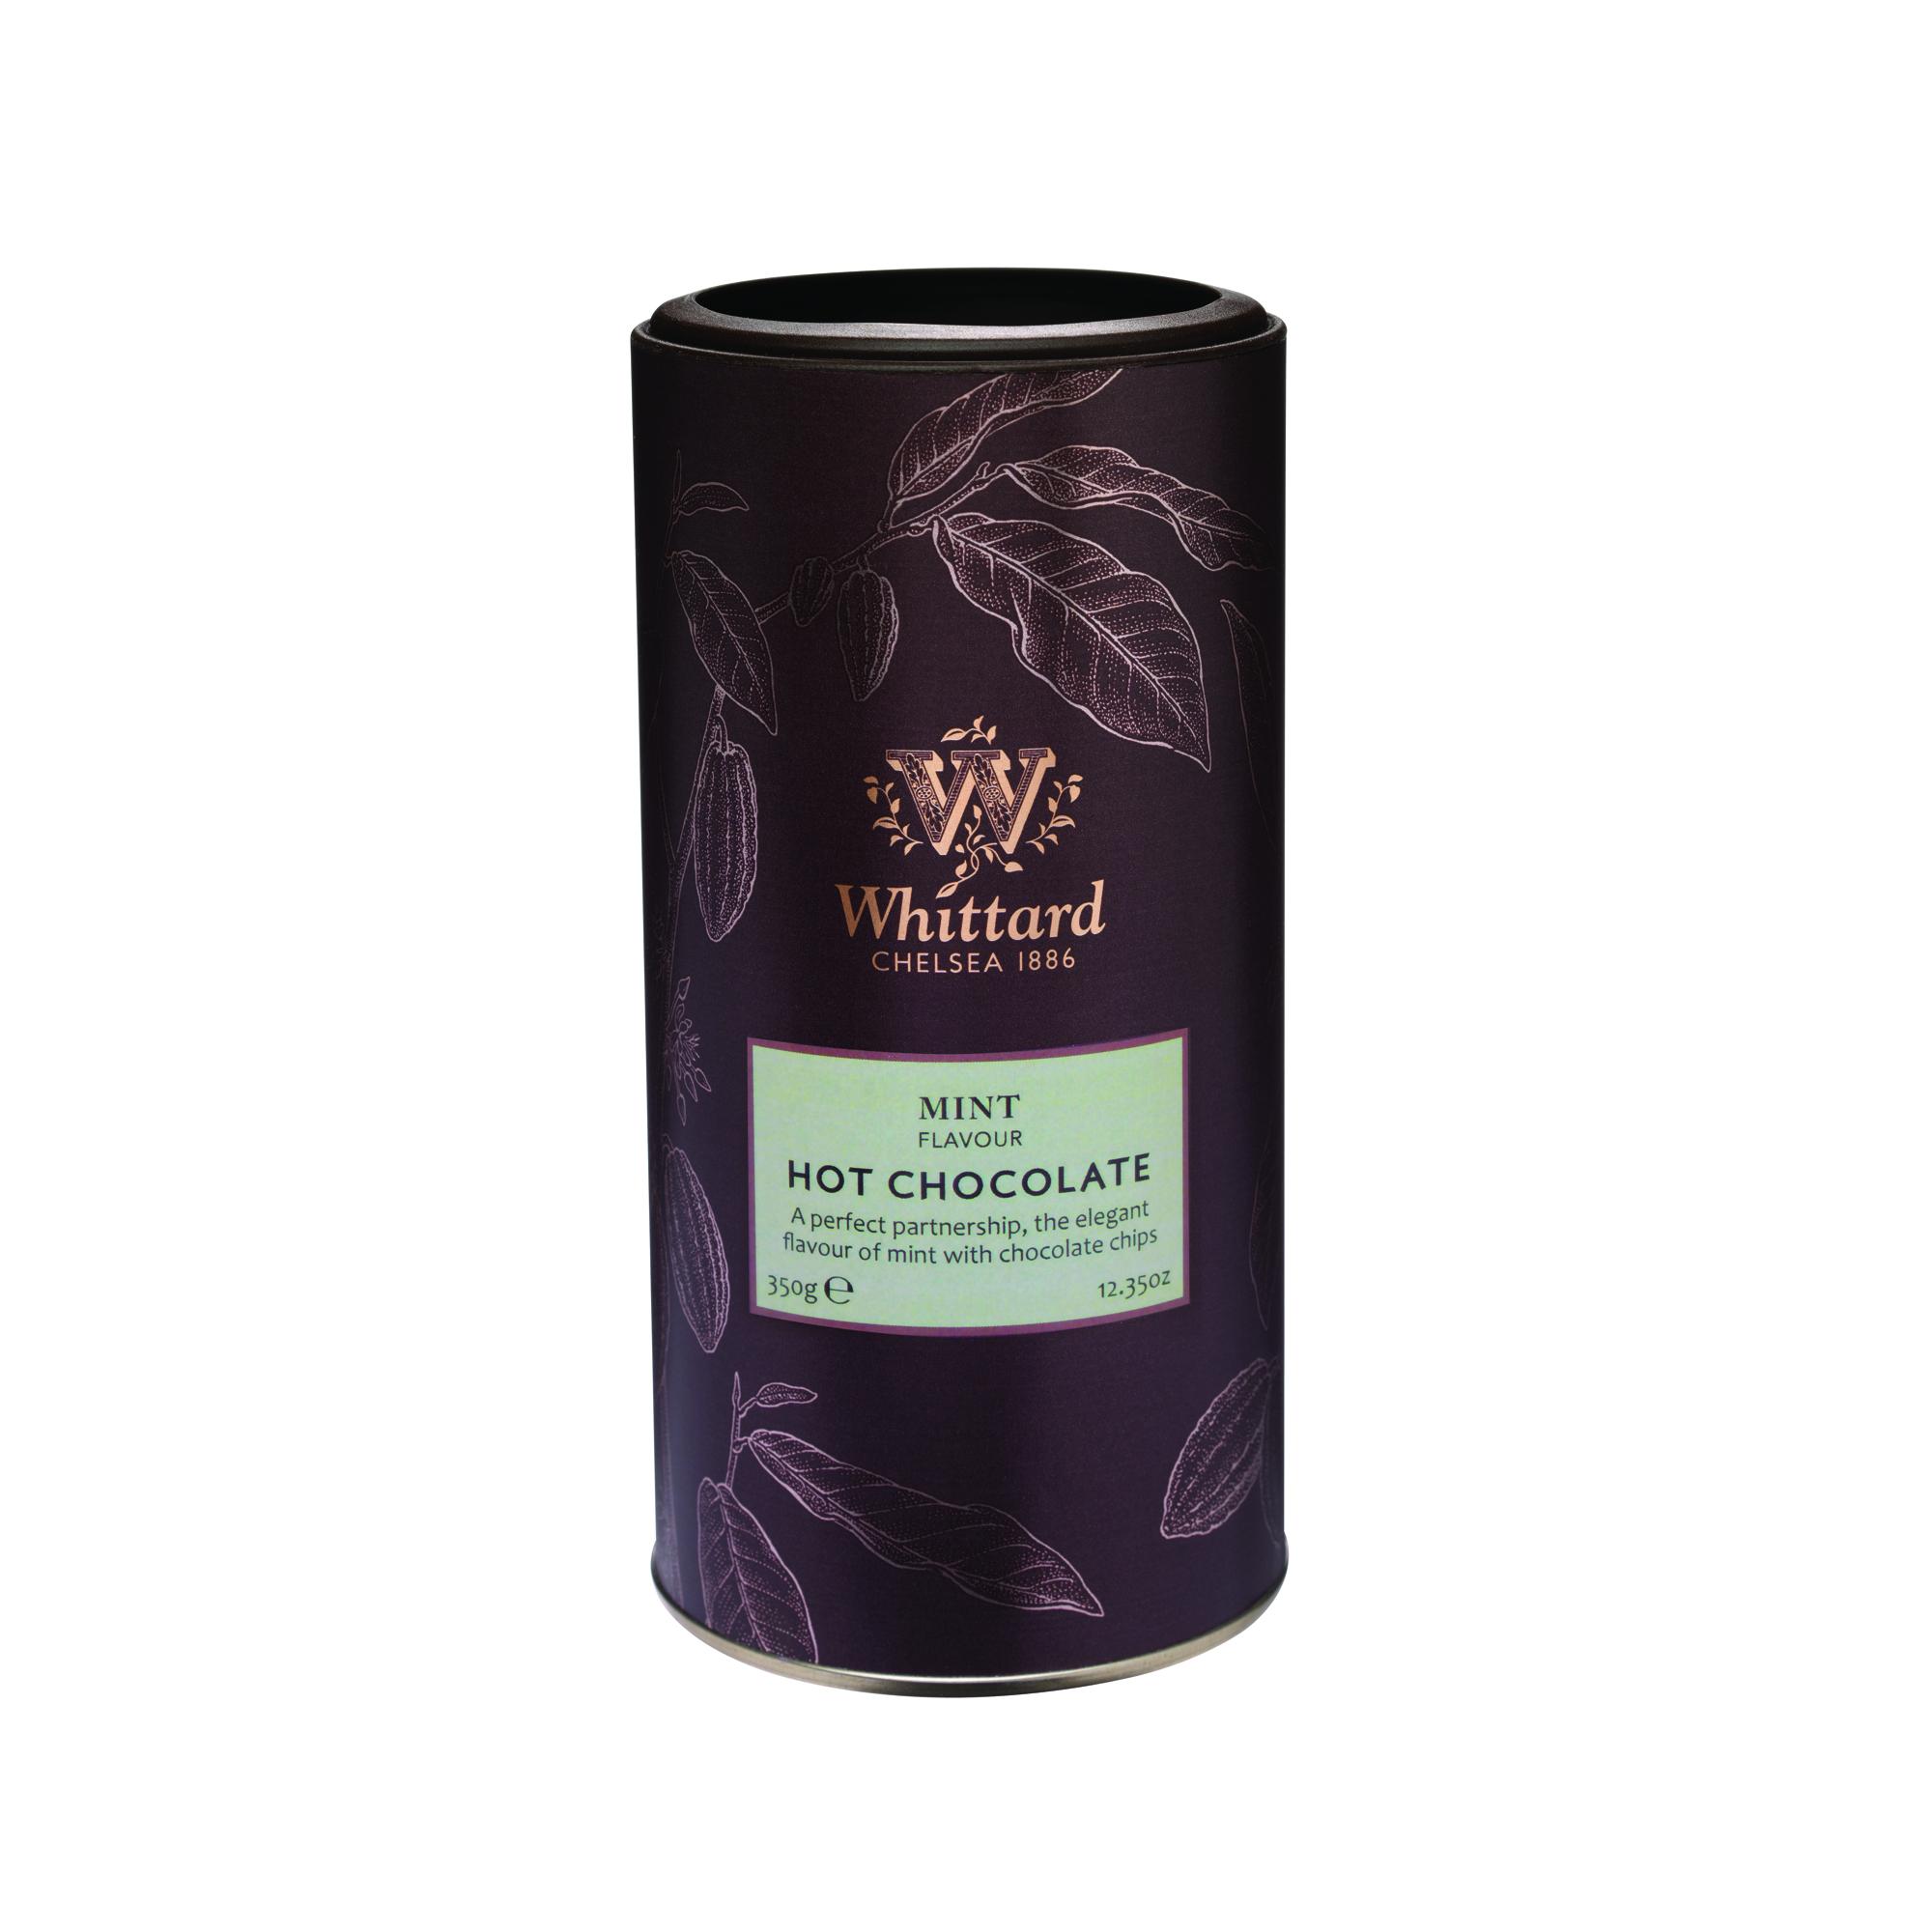 Whittard Mint Hot Chocolate